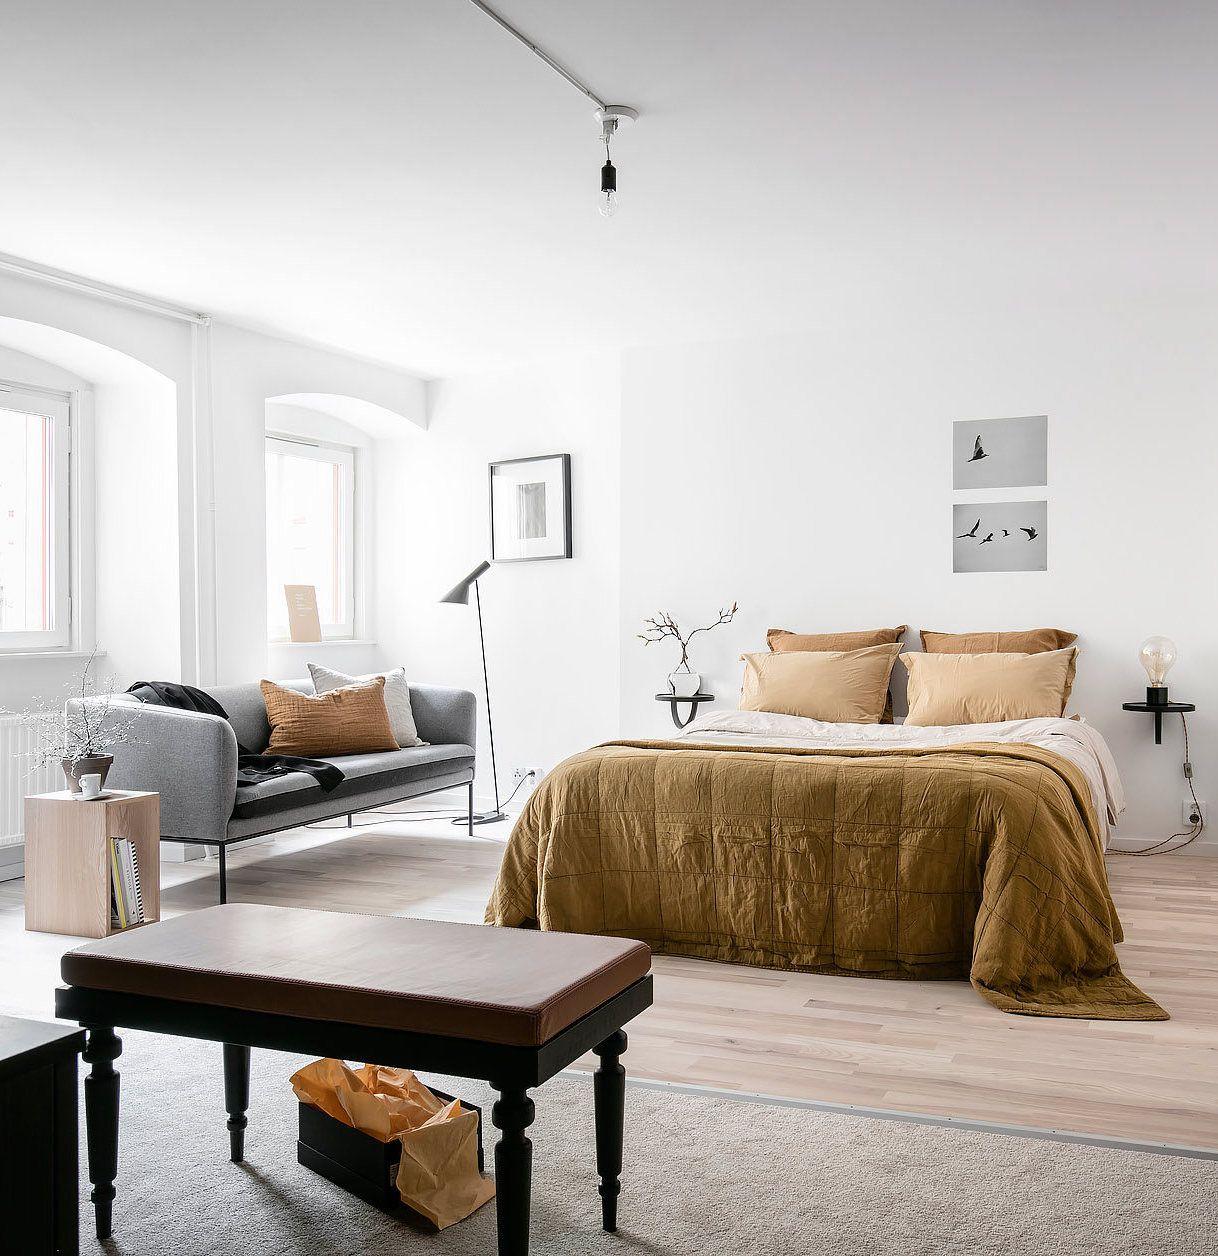 Warm tints of beige, yellow and red | Pinterest | Beige, Bedrooms ...